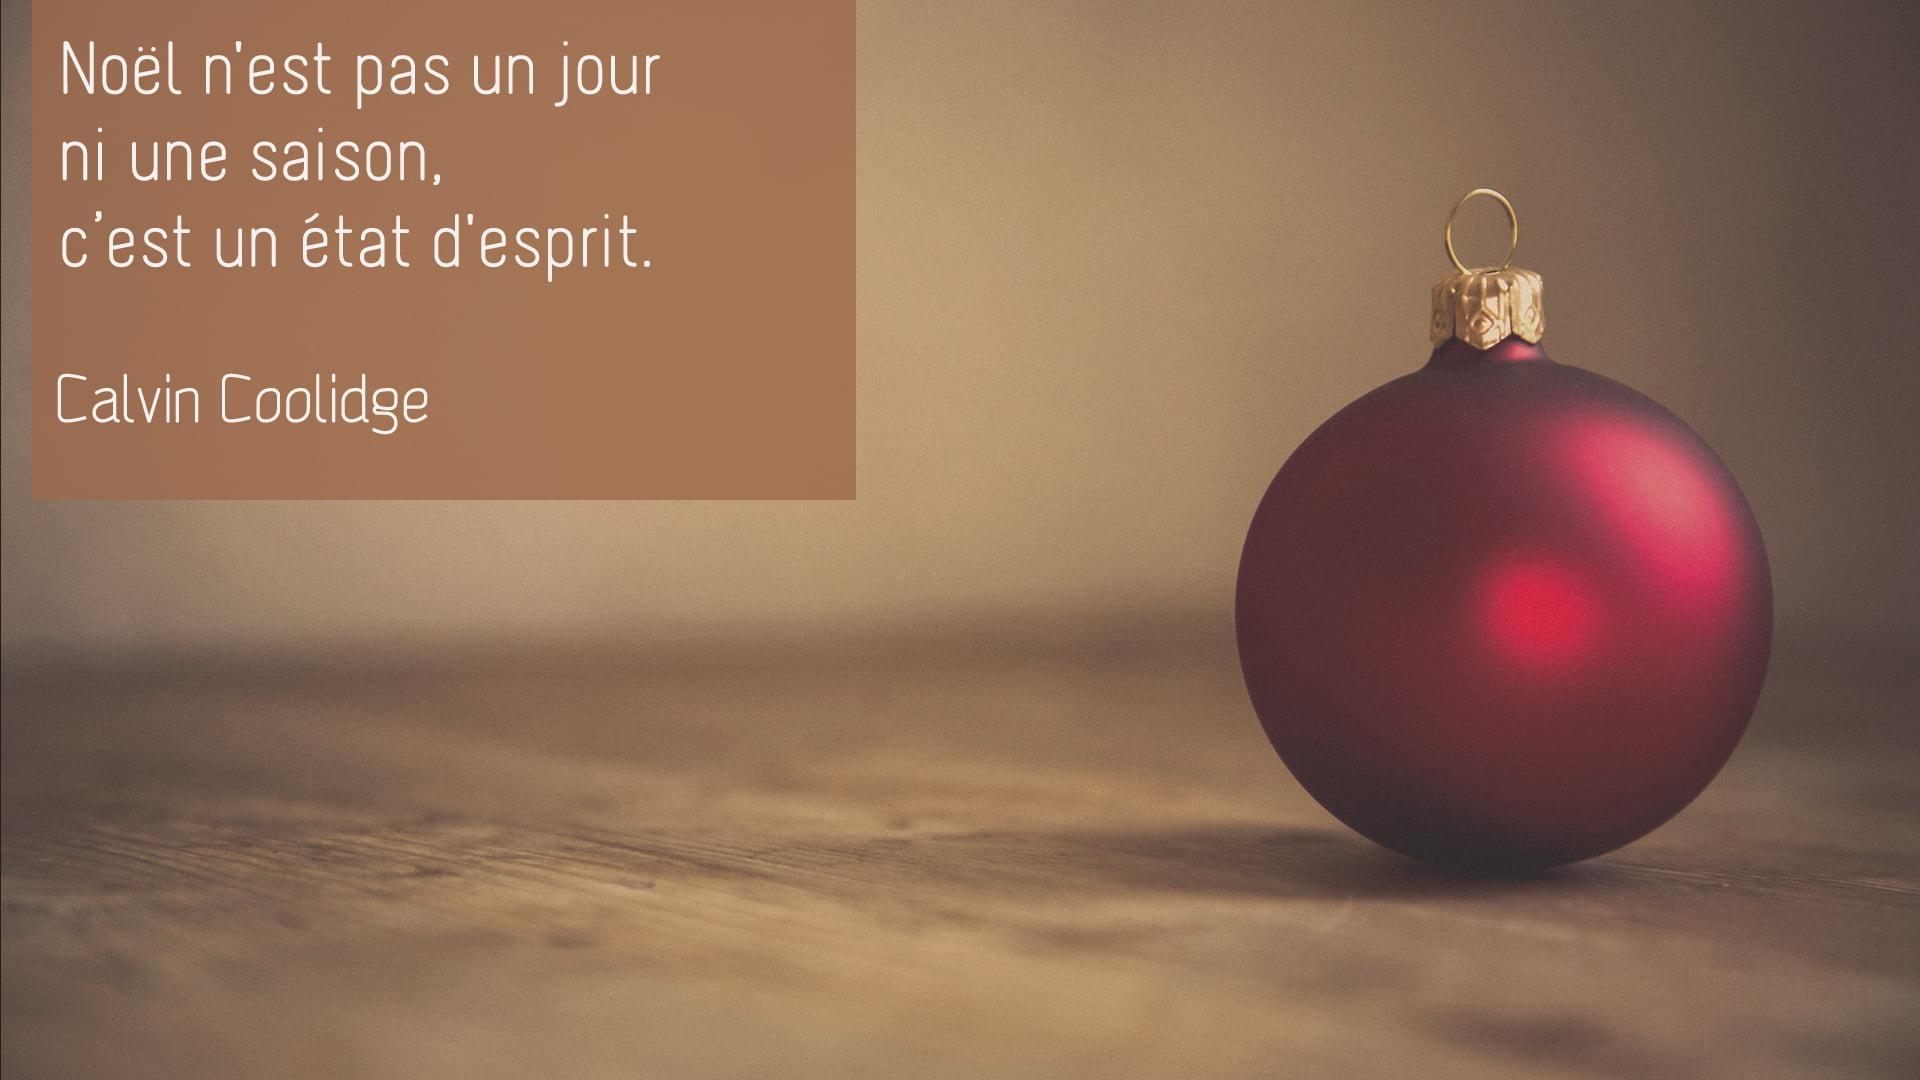 Calvin Coolidge – Noël